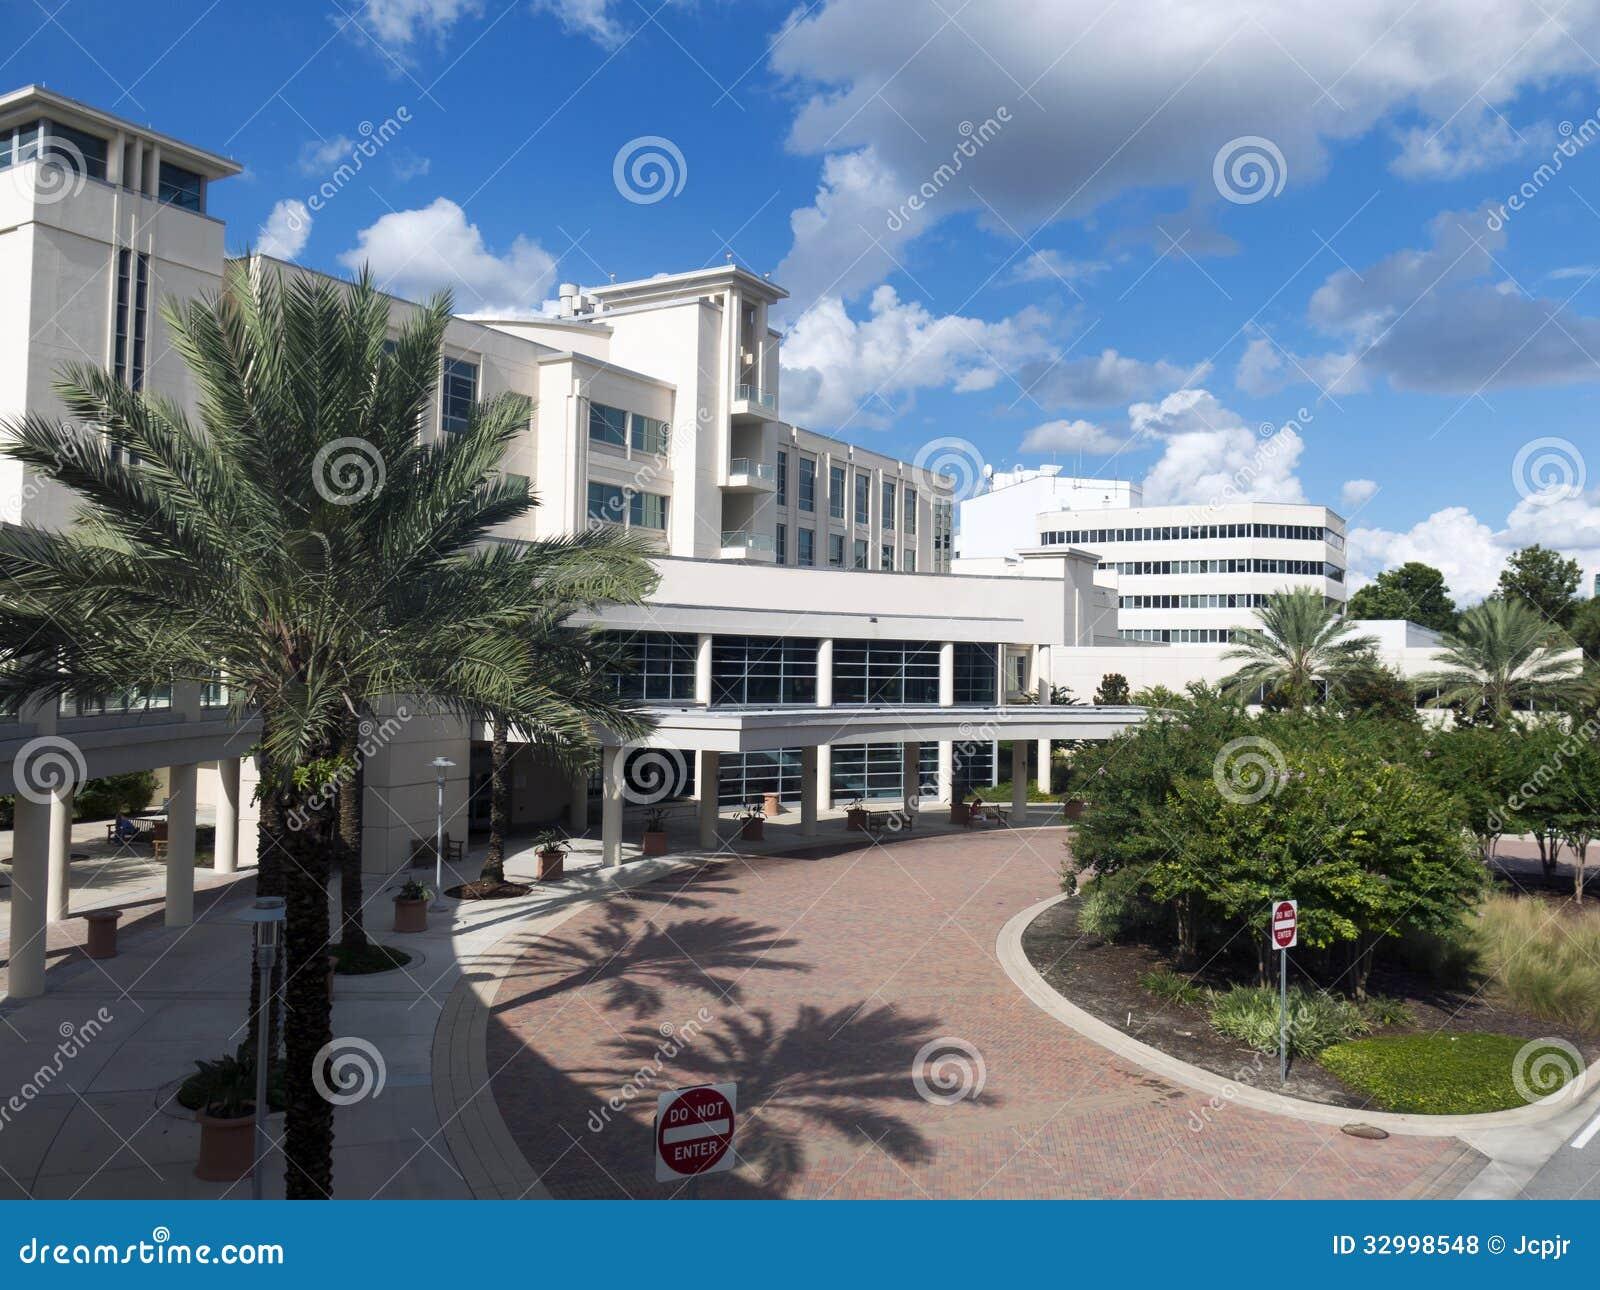 modern hospital - Hapital Moderne